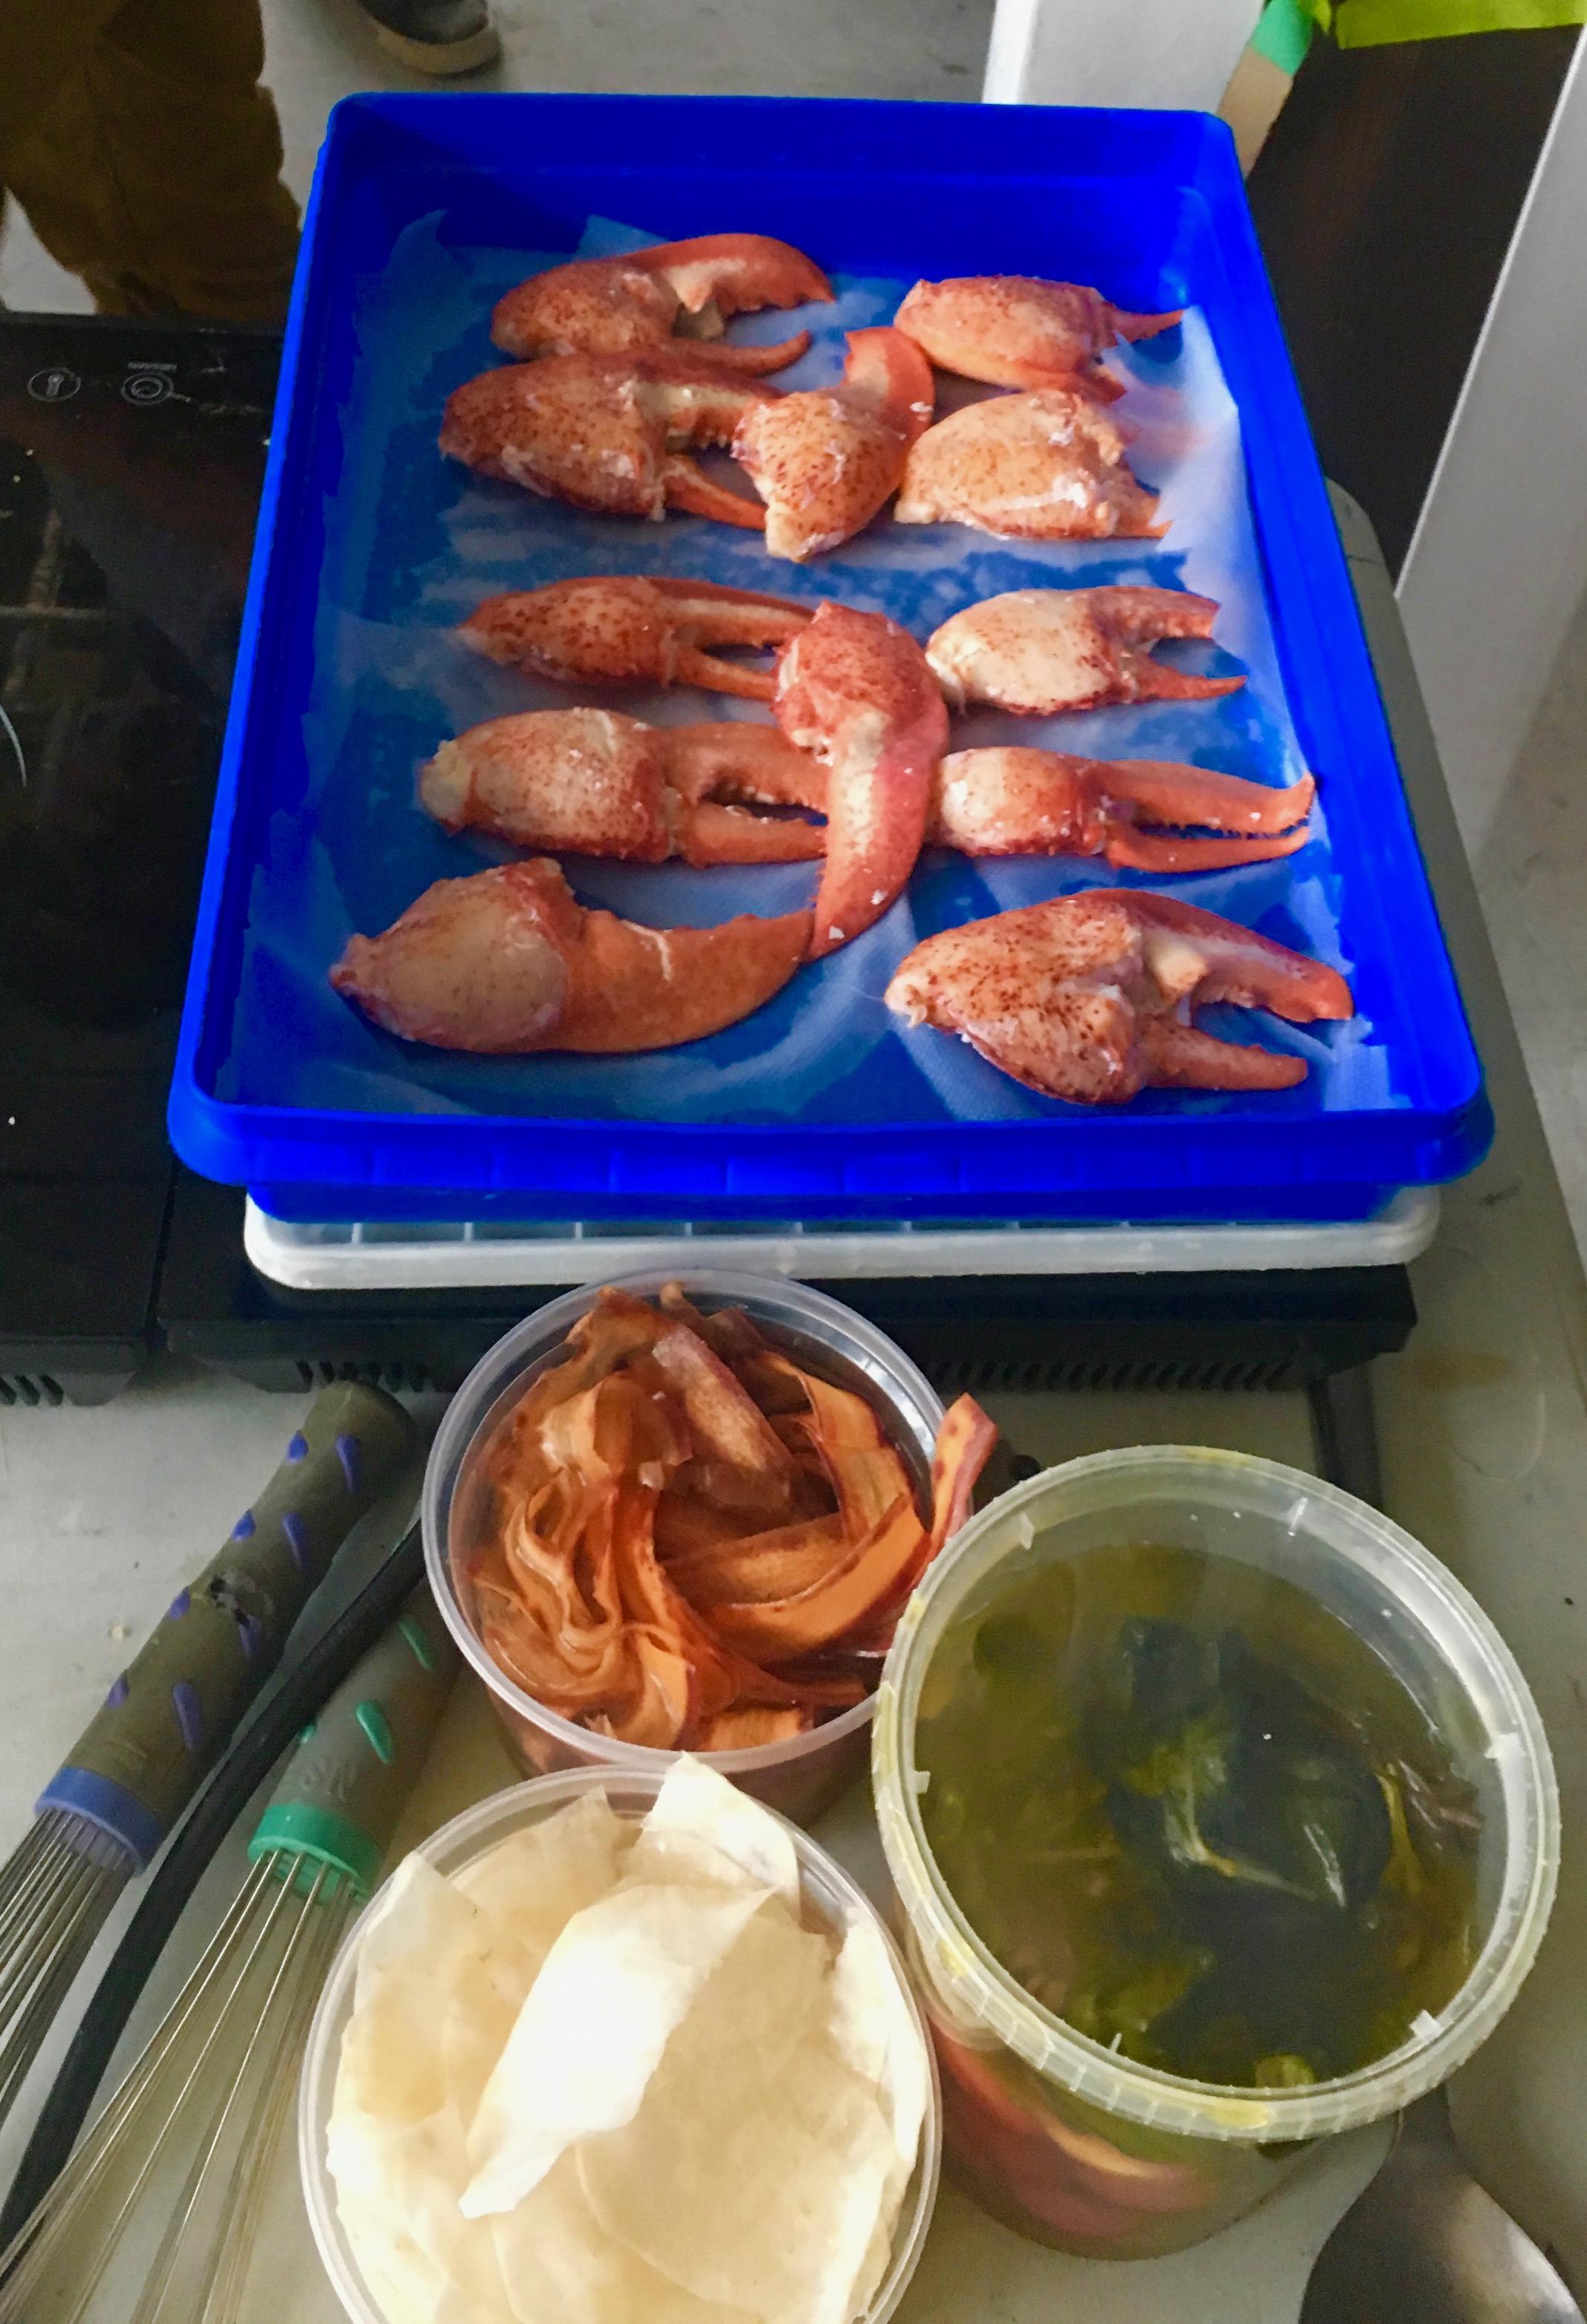 Iles de la Madelaine lobster claws